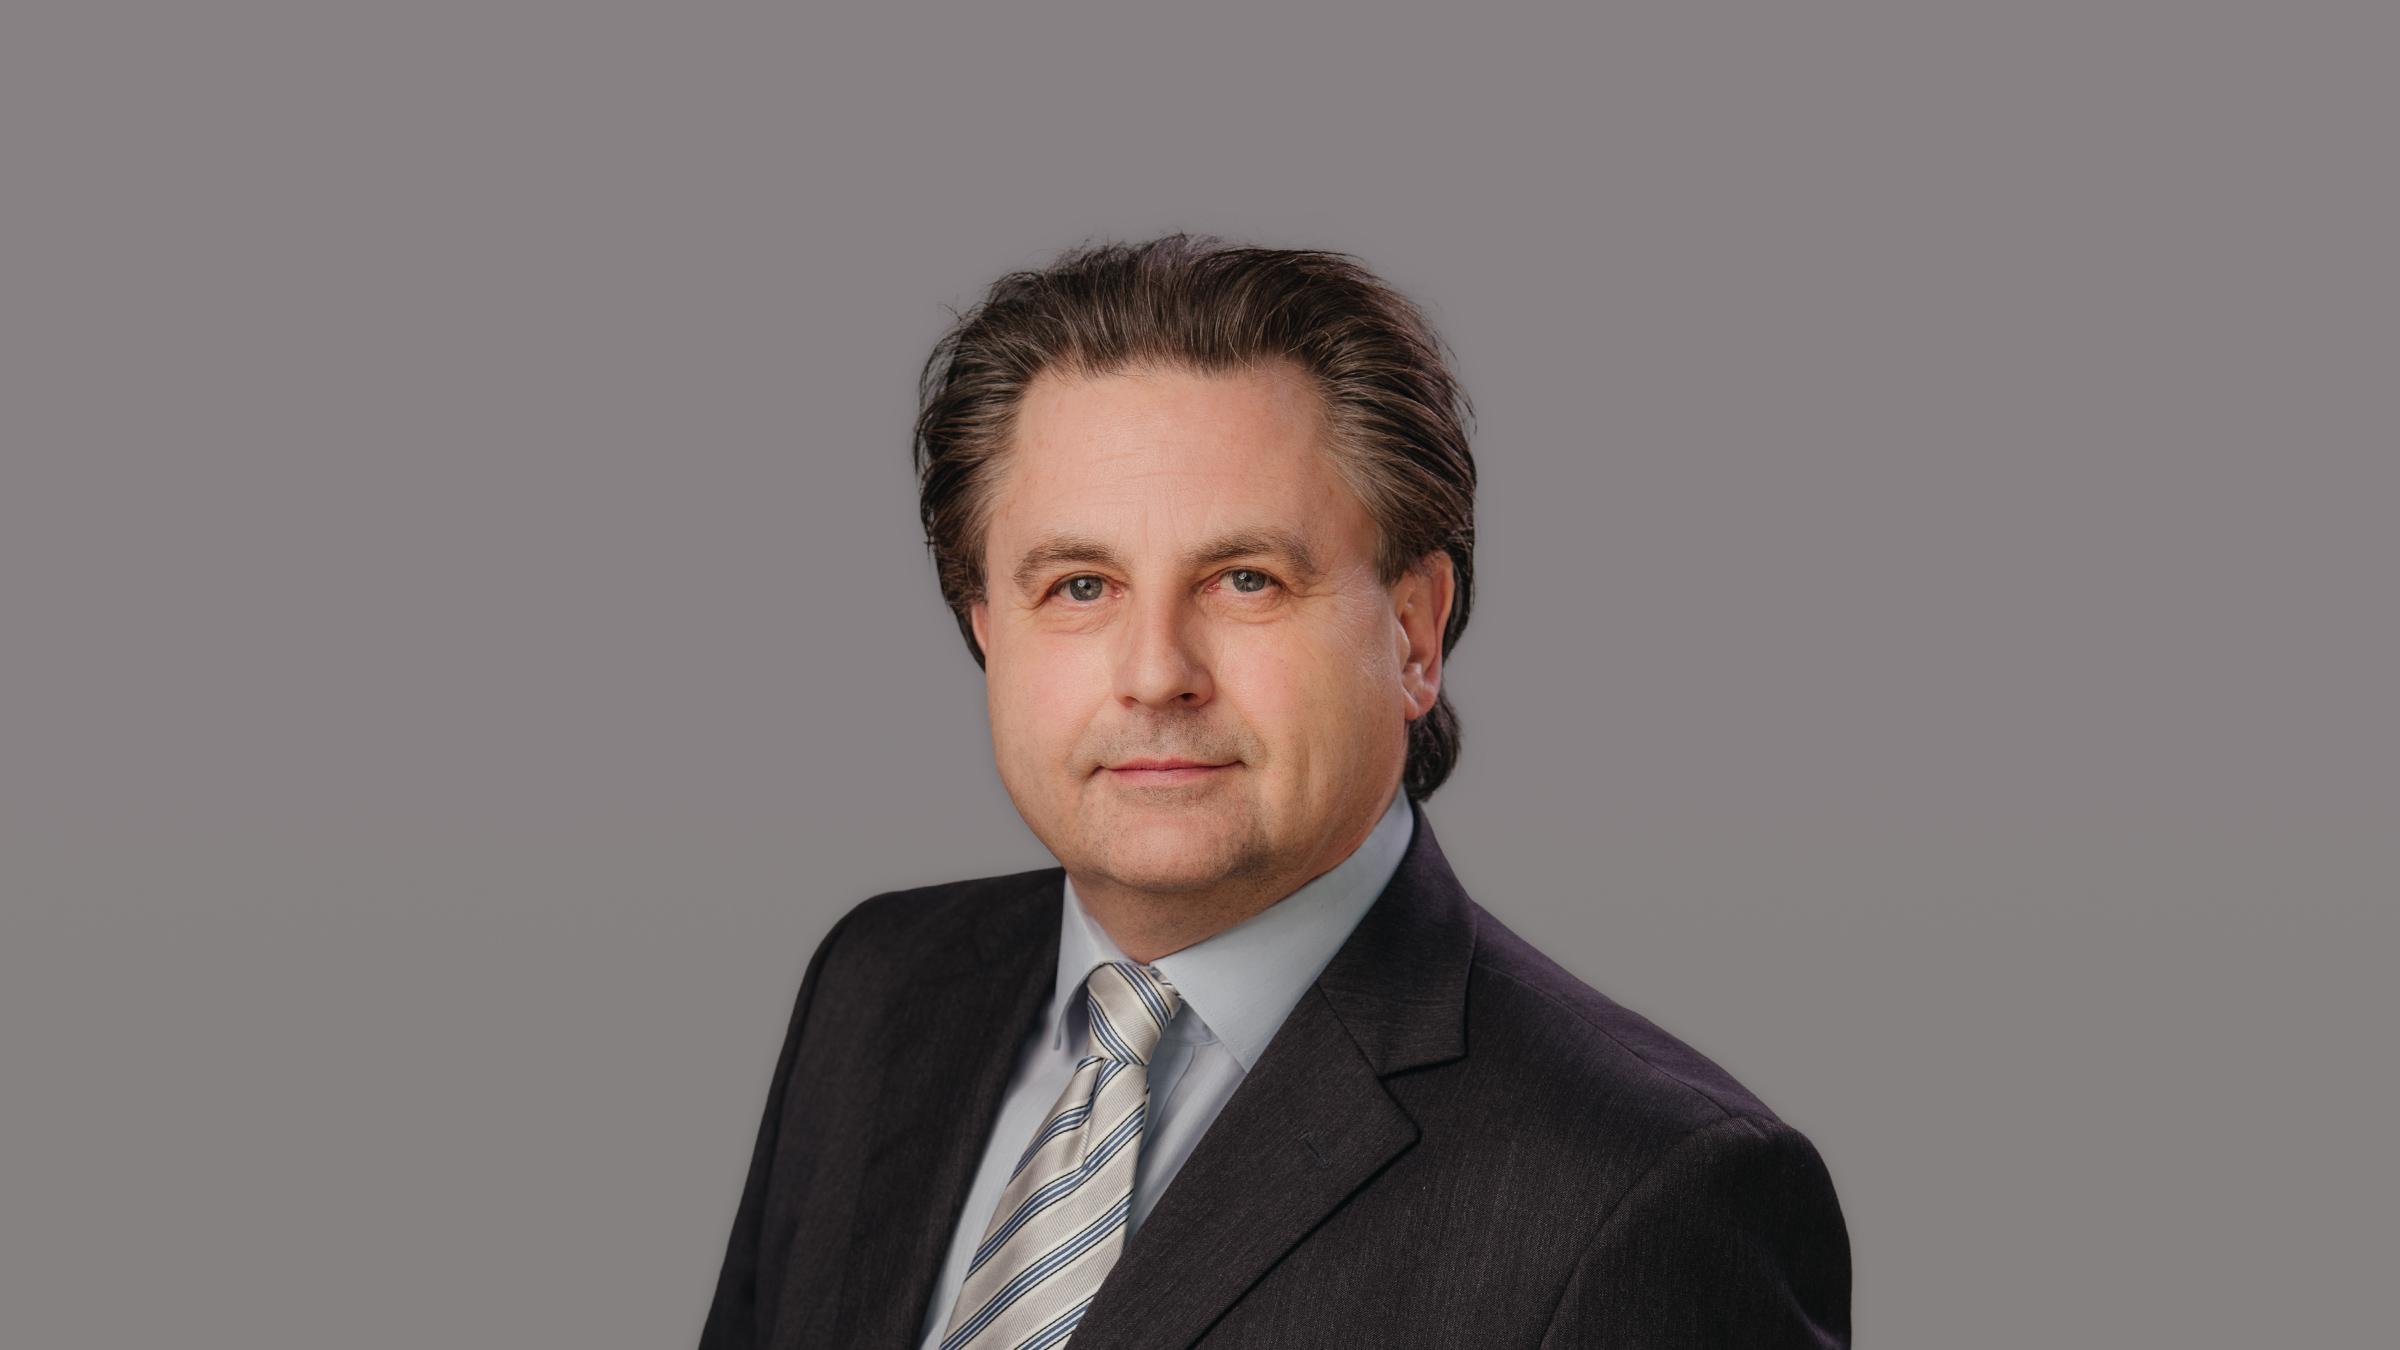 Matthias Sieber